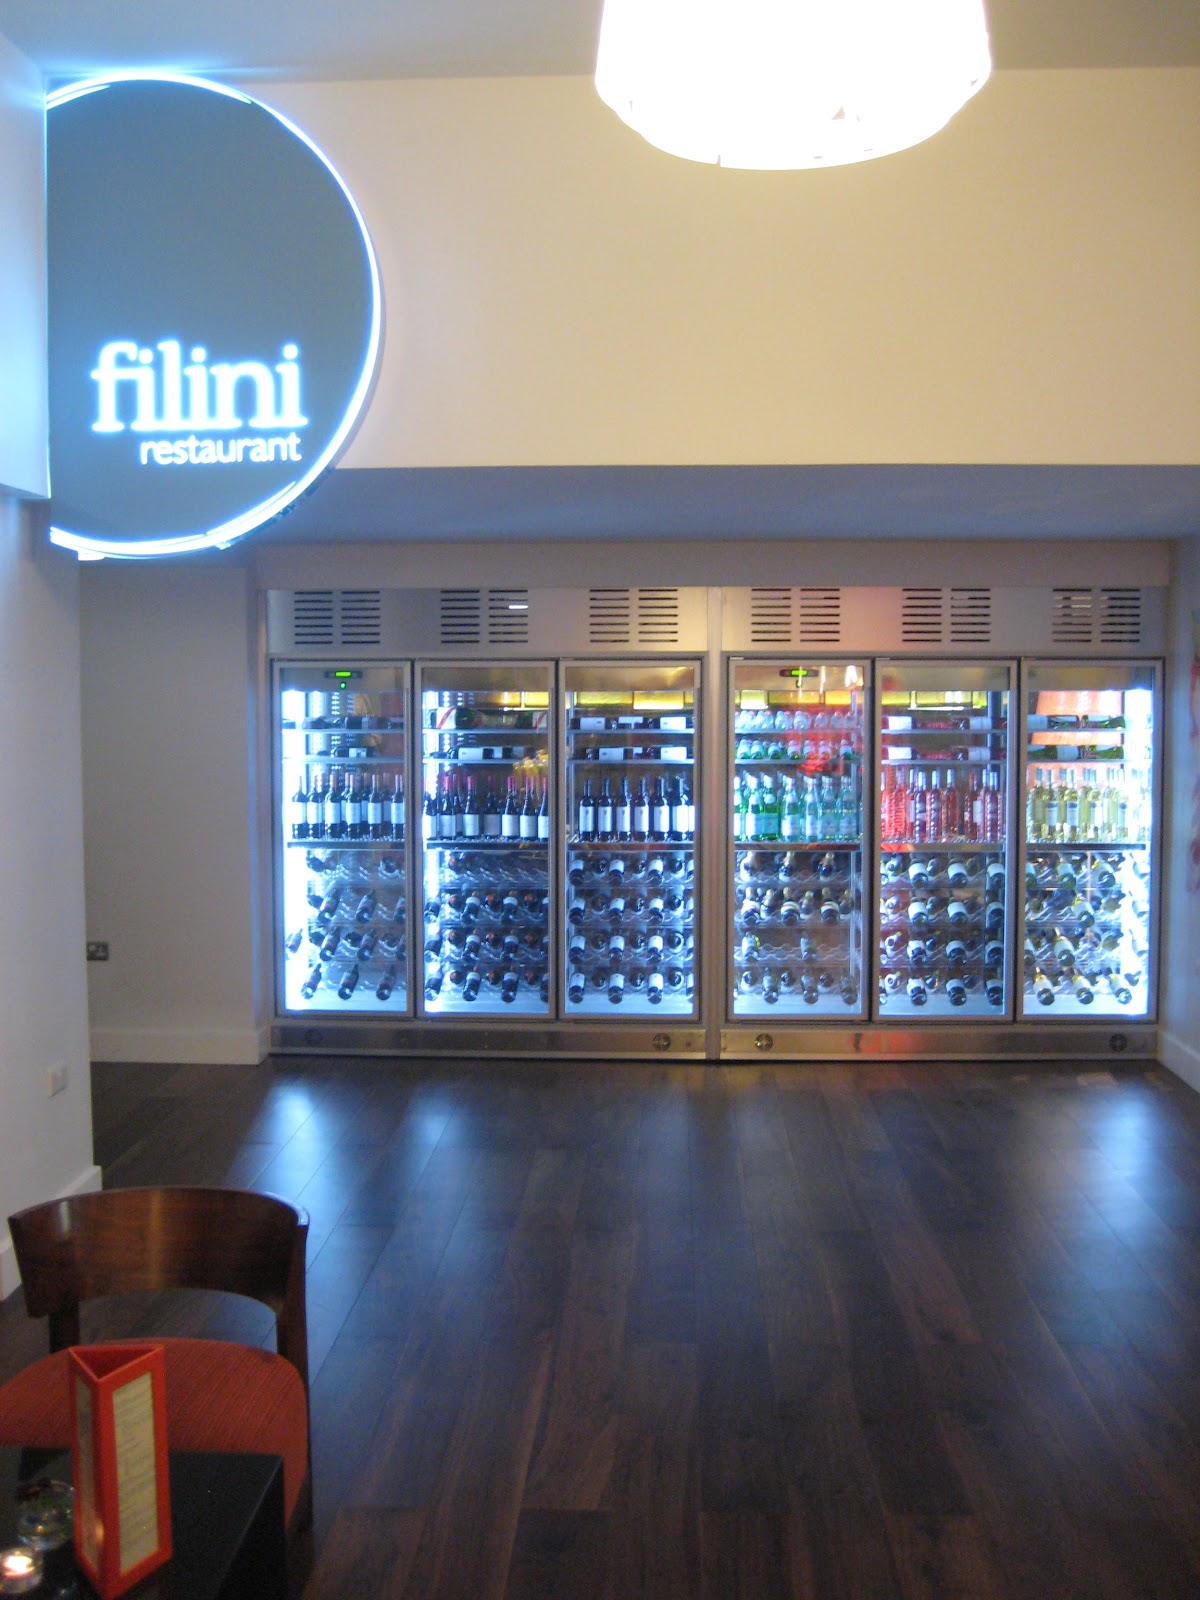 GourmetGorro: Filini Italian restaurant, Radisson Blu Cardiff Review